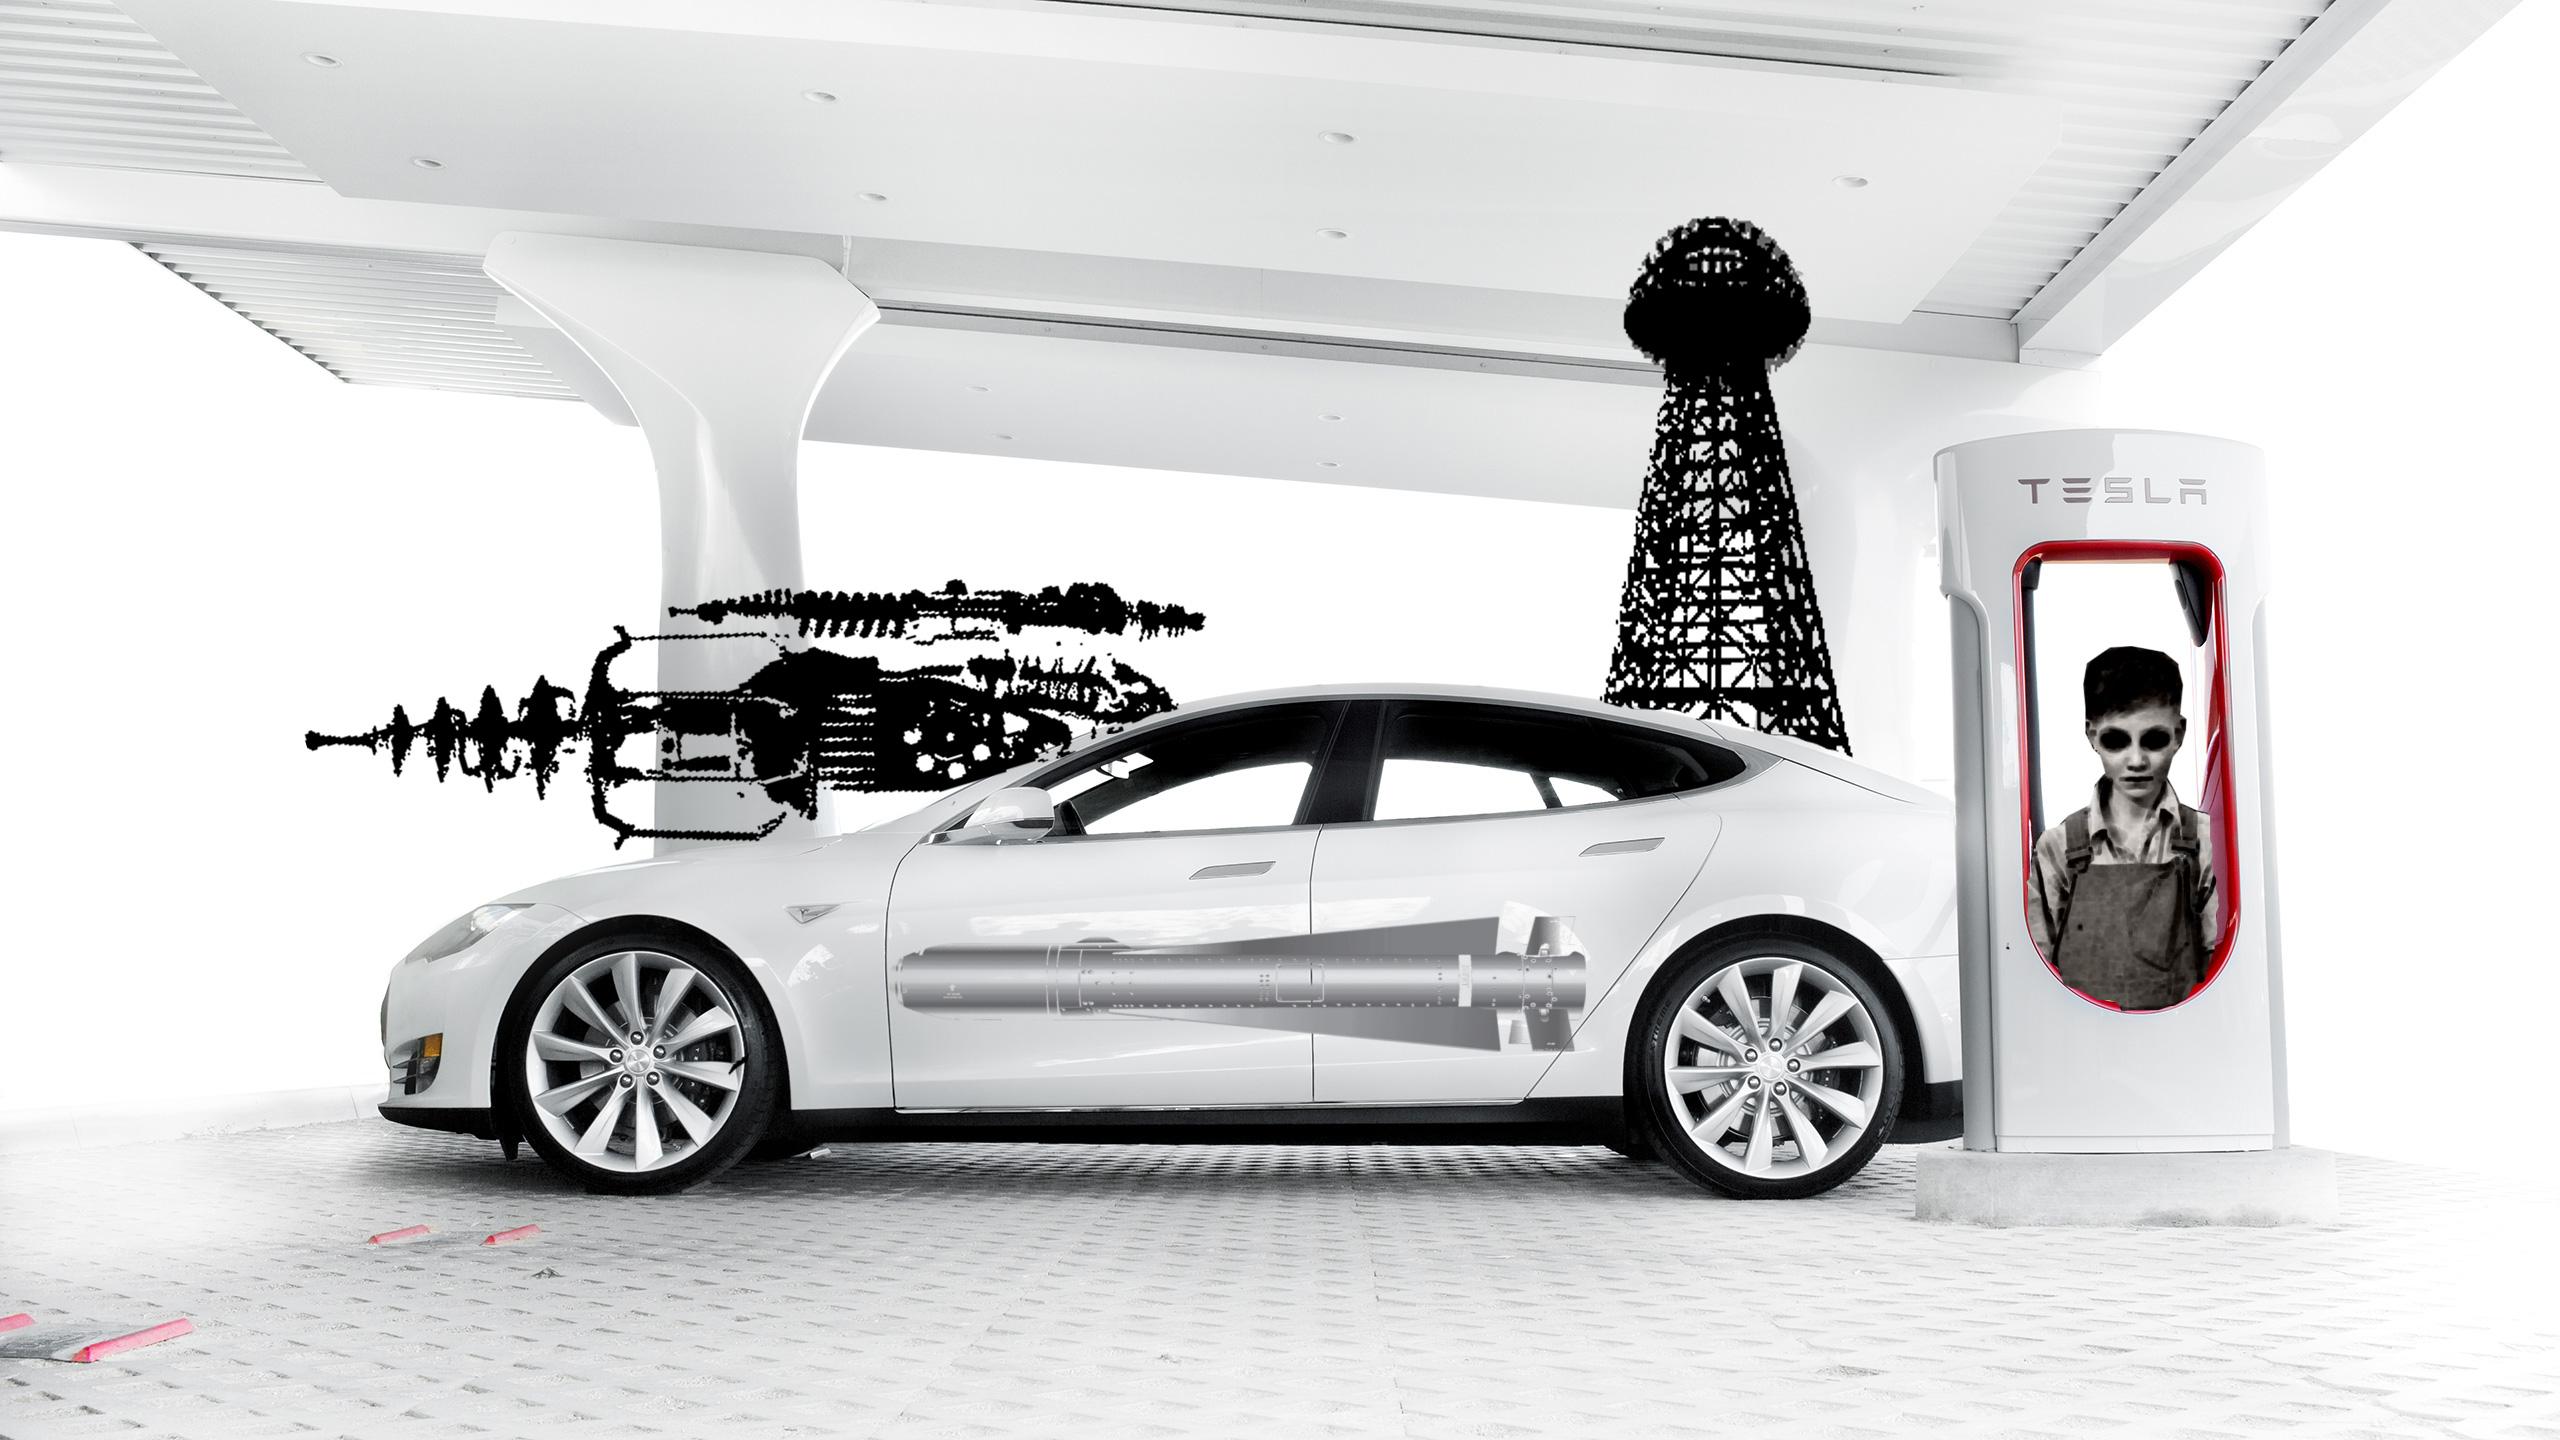 tesla-model-s-supercharging